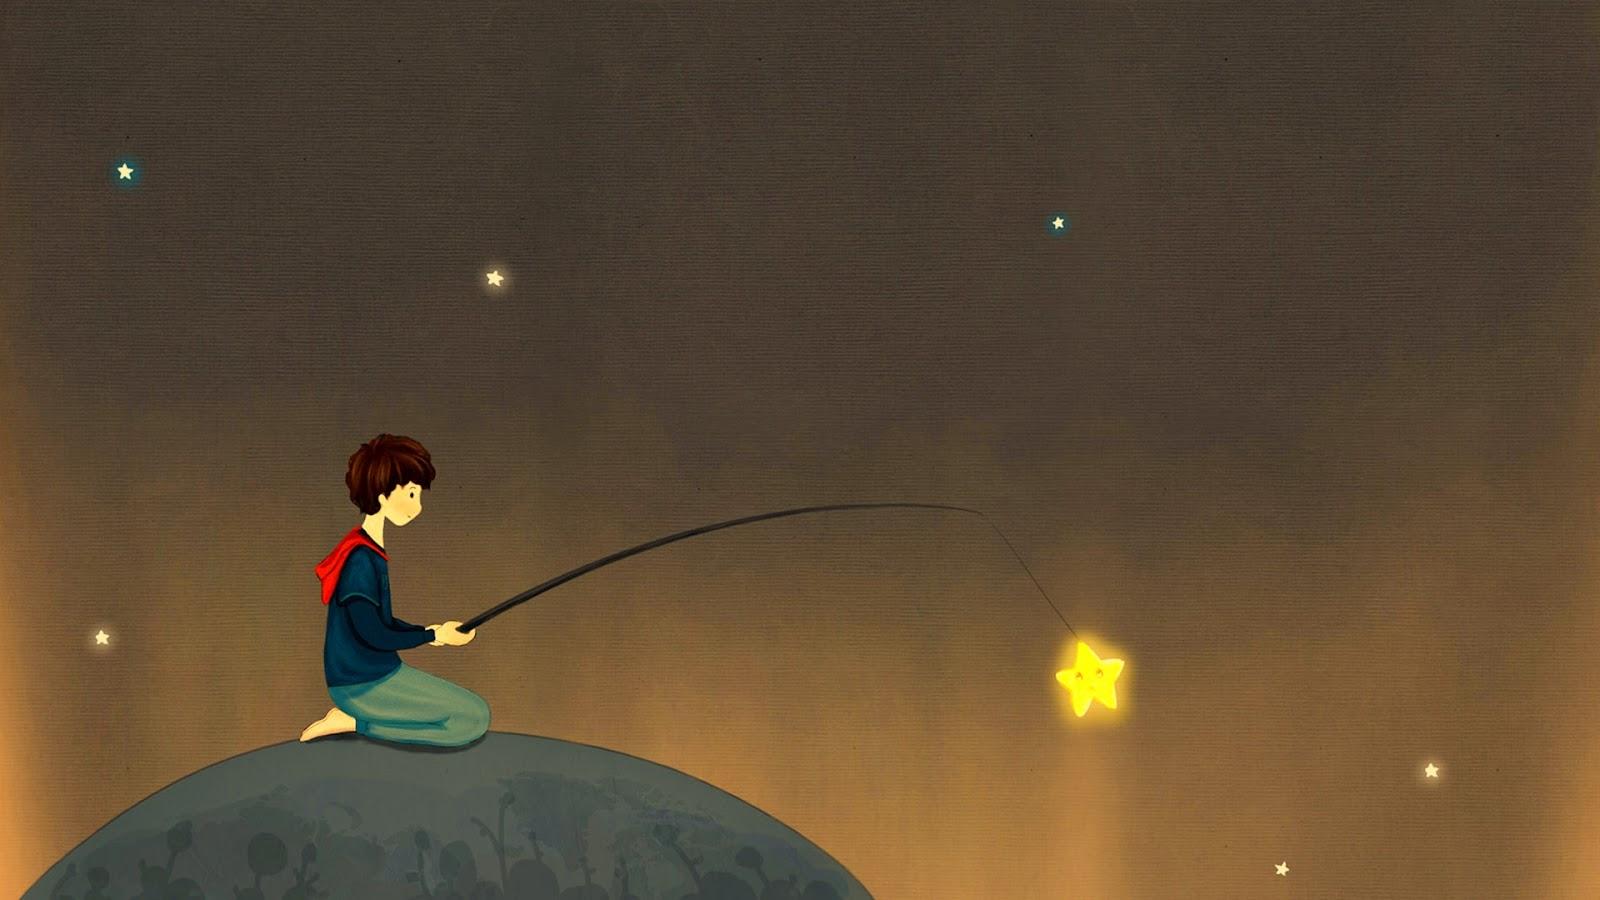 http://1.bp.blogspot.com/-ZoOGkOCHt4U/UPxJmP0npNI/AAAAAAAAD9E/CDpVN3aFhRY/s1600/children_fantasy_art_sci_fi_planets_stars_fishing_cute.jpg